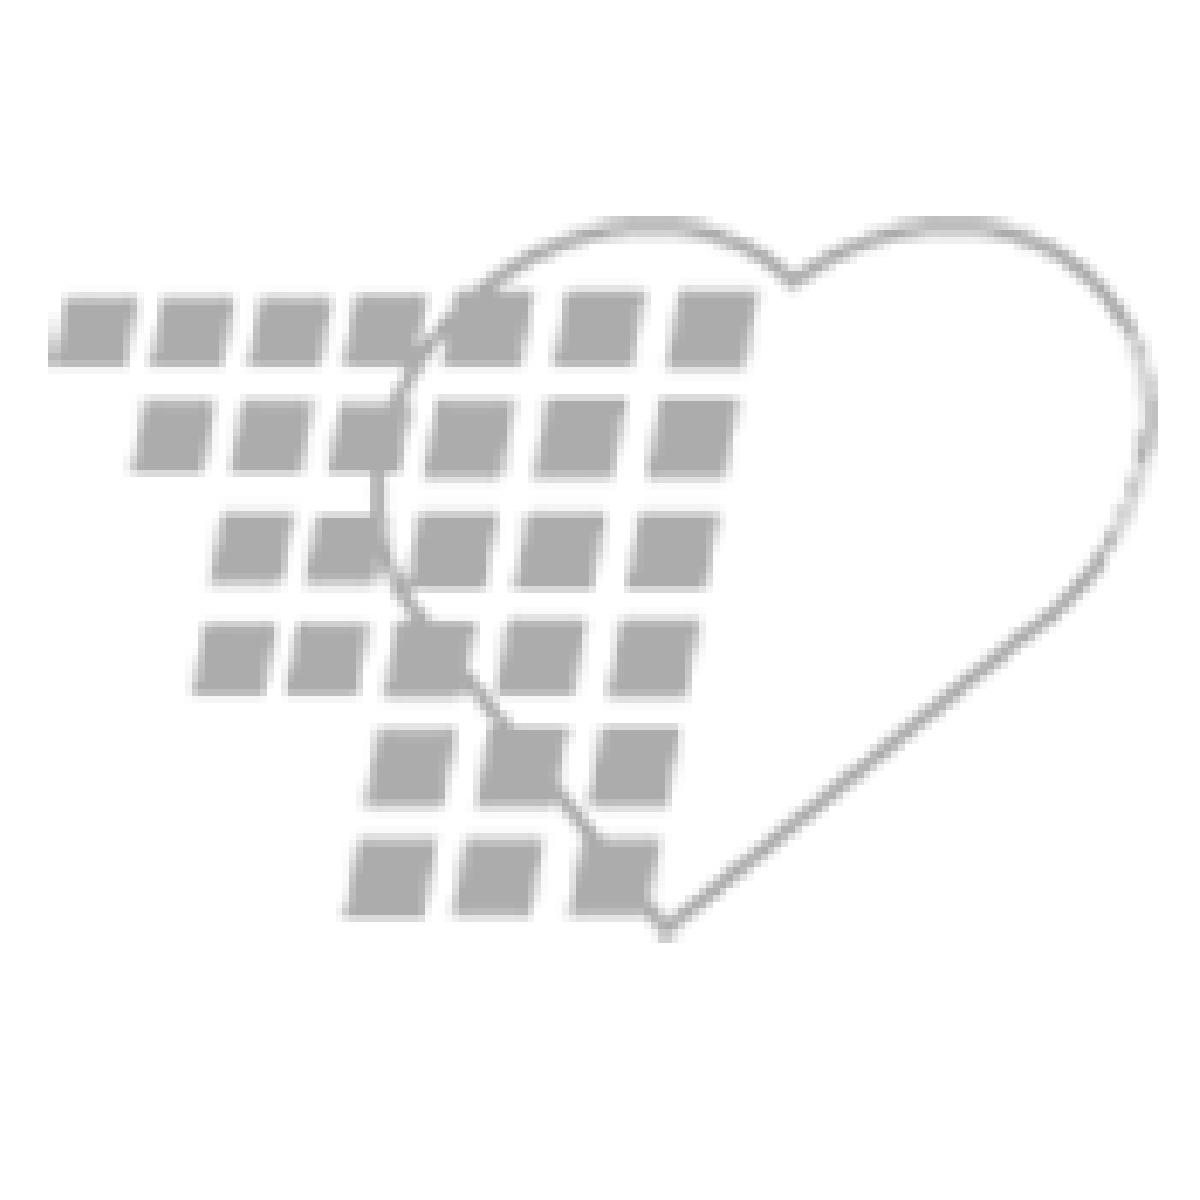 06-18-0422 ChemoPlus™ Chemo Soft Waste Bag